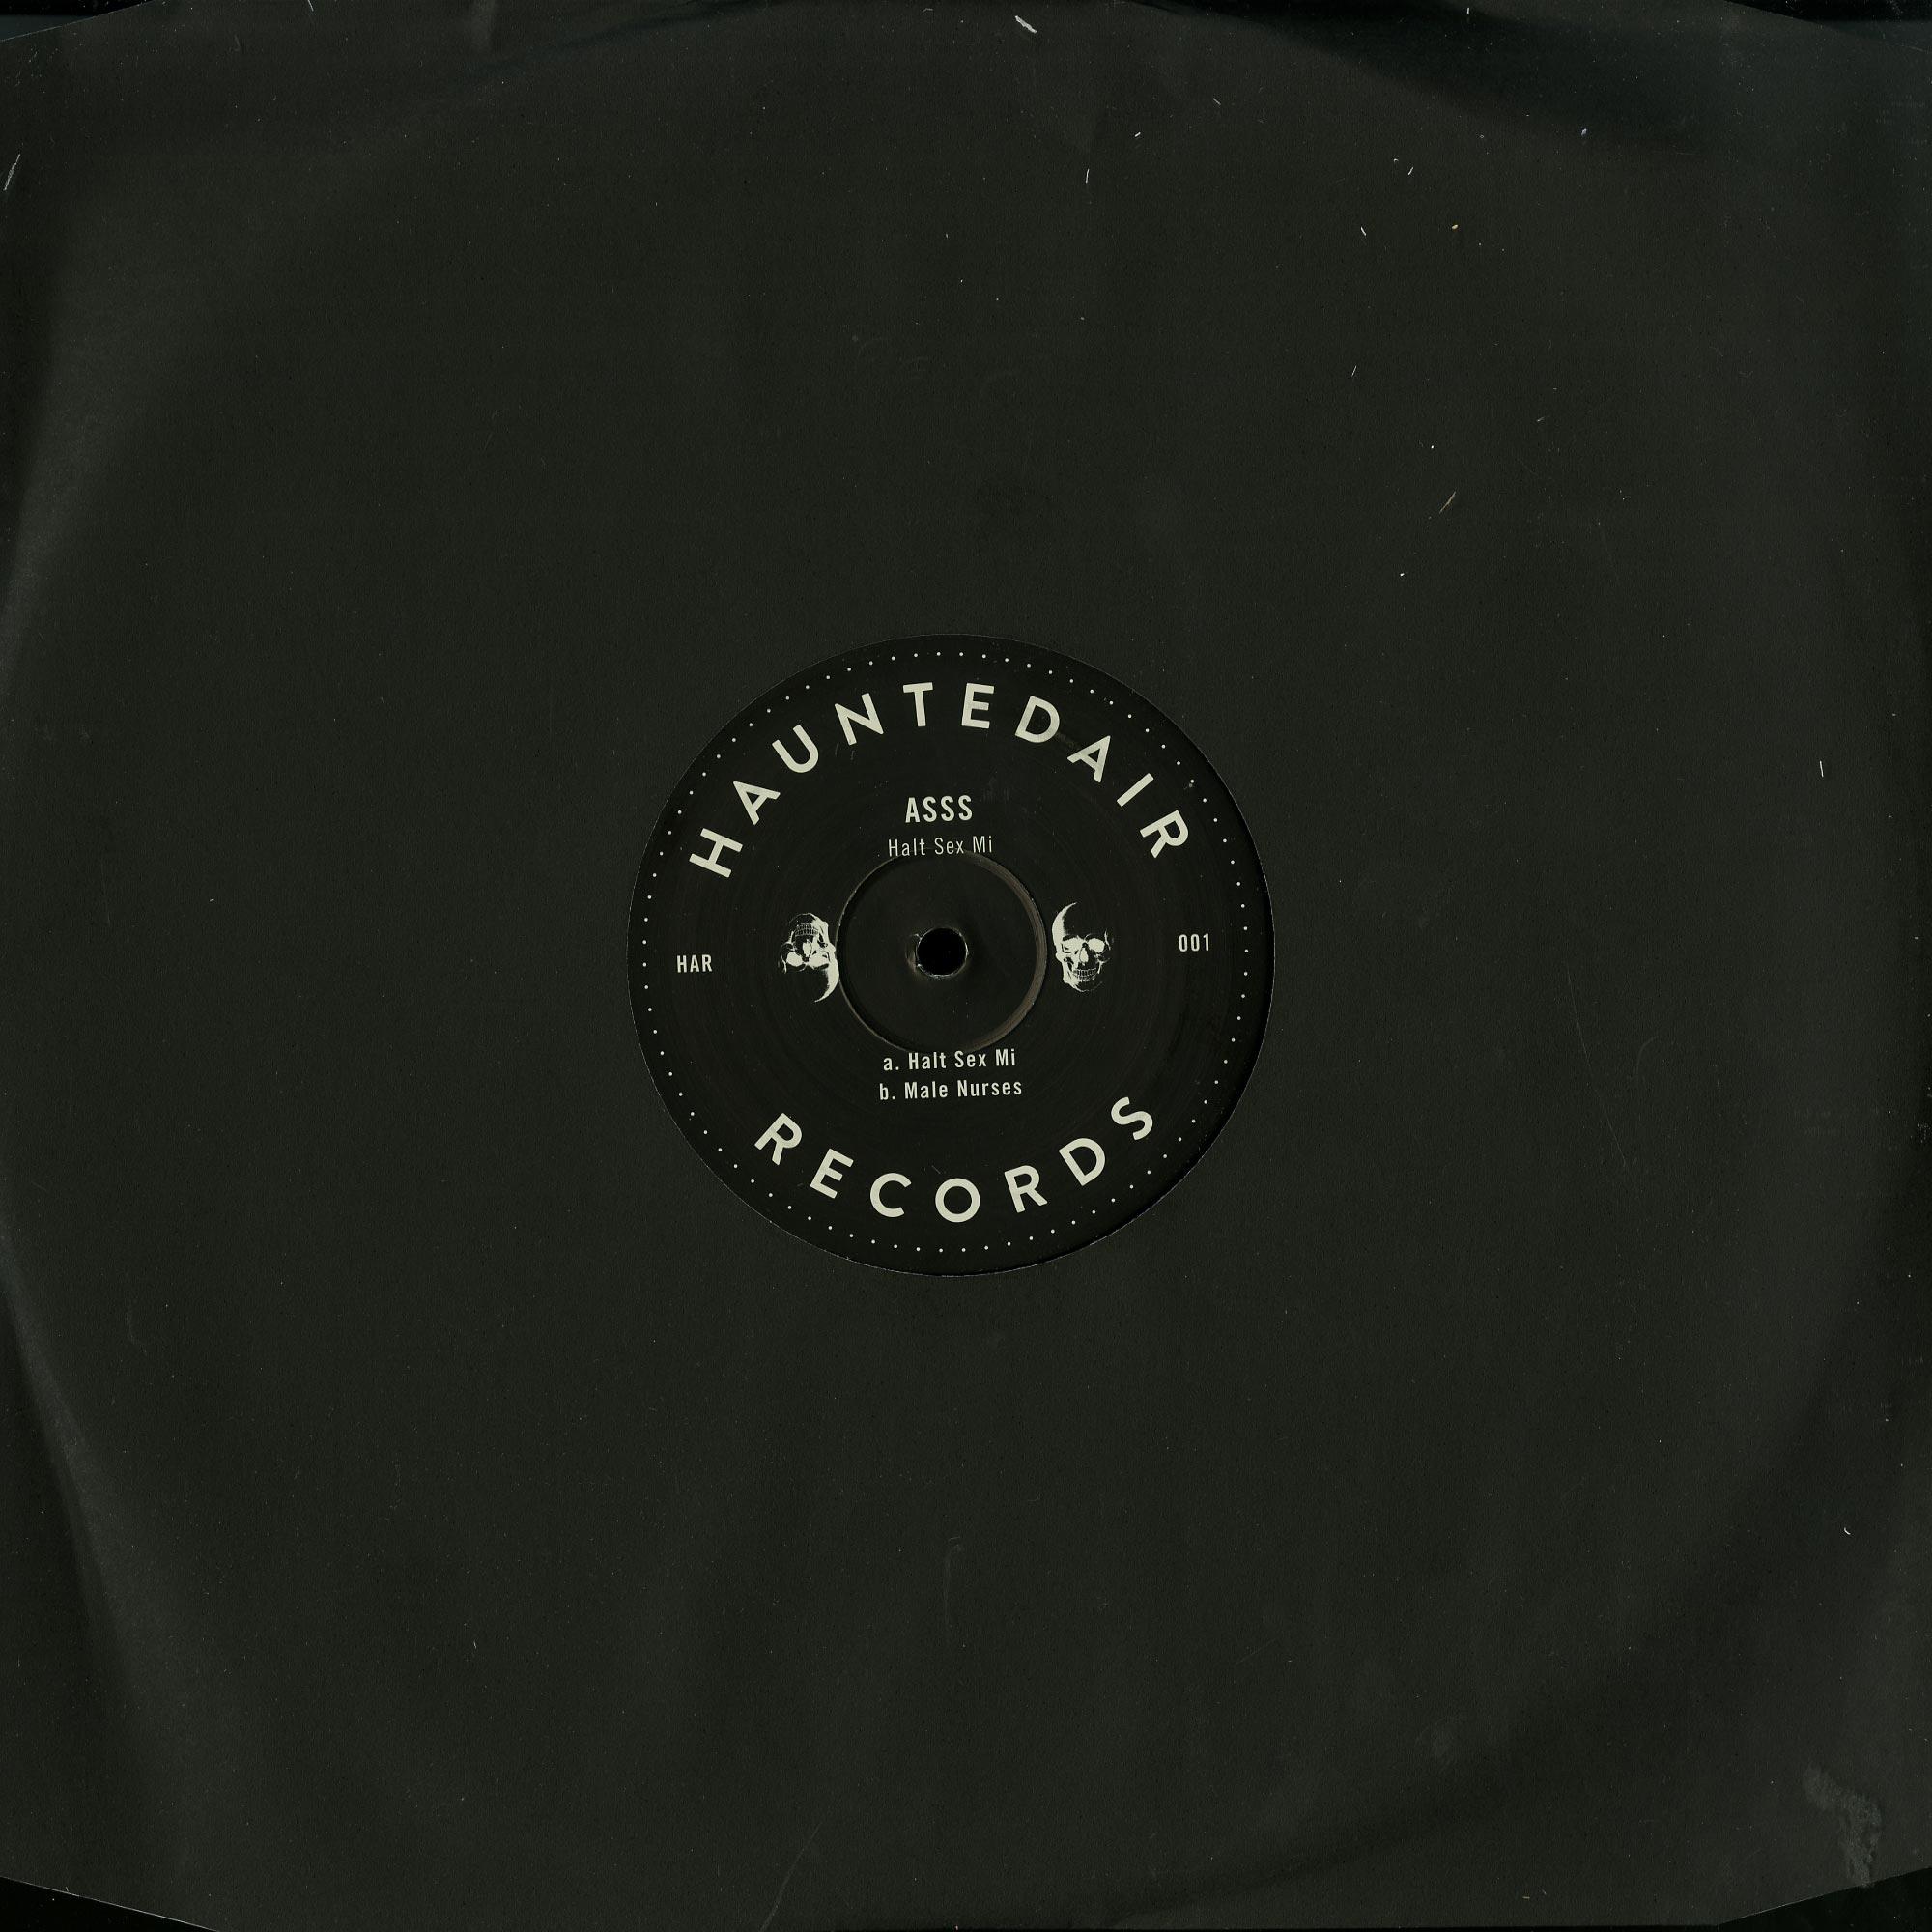 asss - halt sex mi - vinyl shop